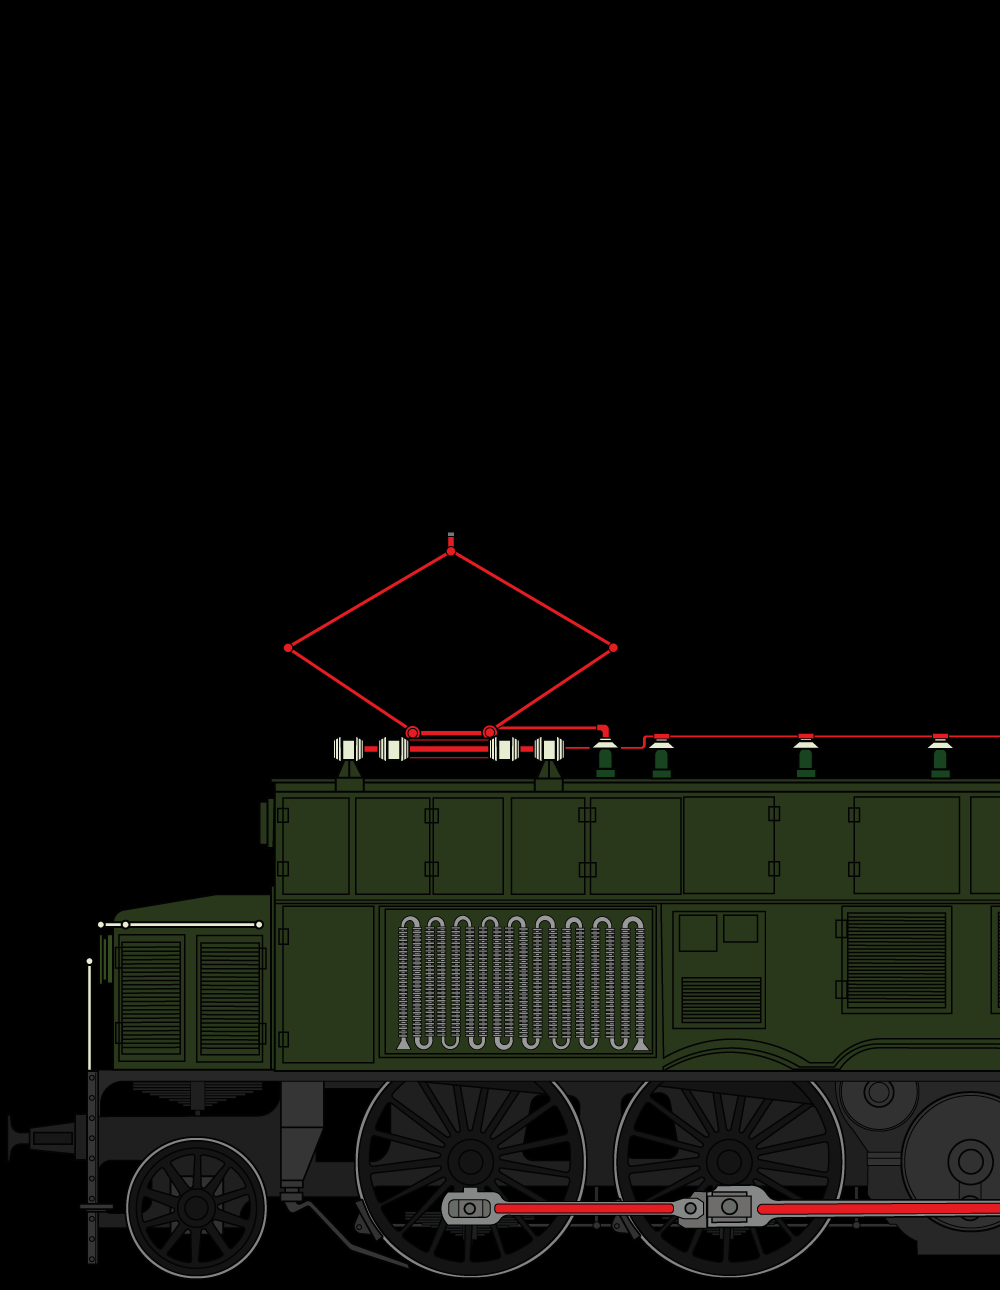 Reihe 1029/1073 - Die erste E-Lokomotive im Salzkammergut